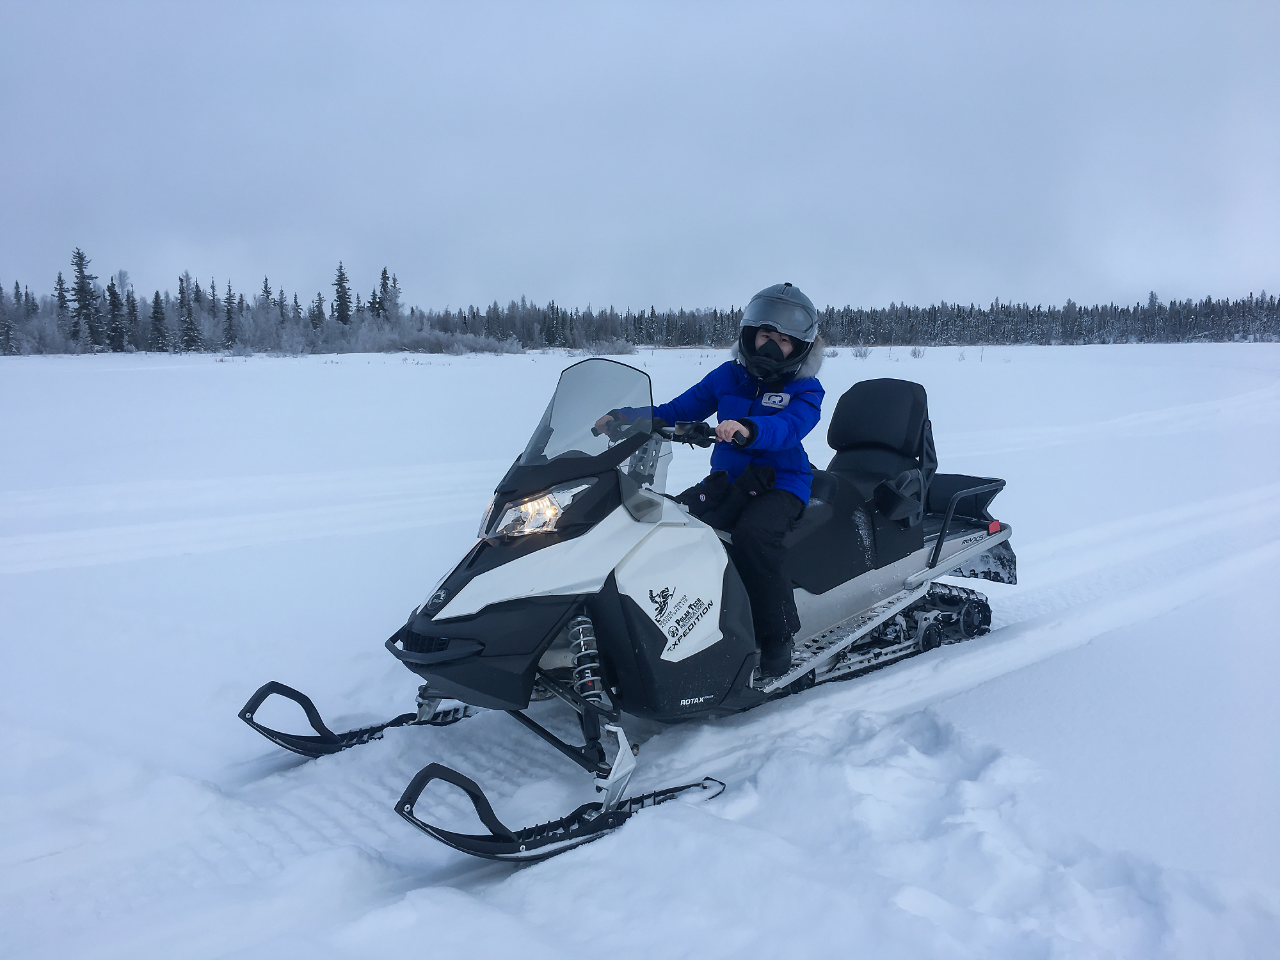 Staycation Yellowknife Snowmobile Adventure